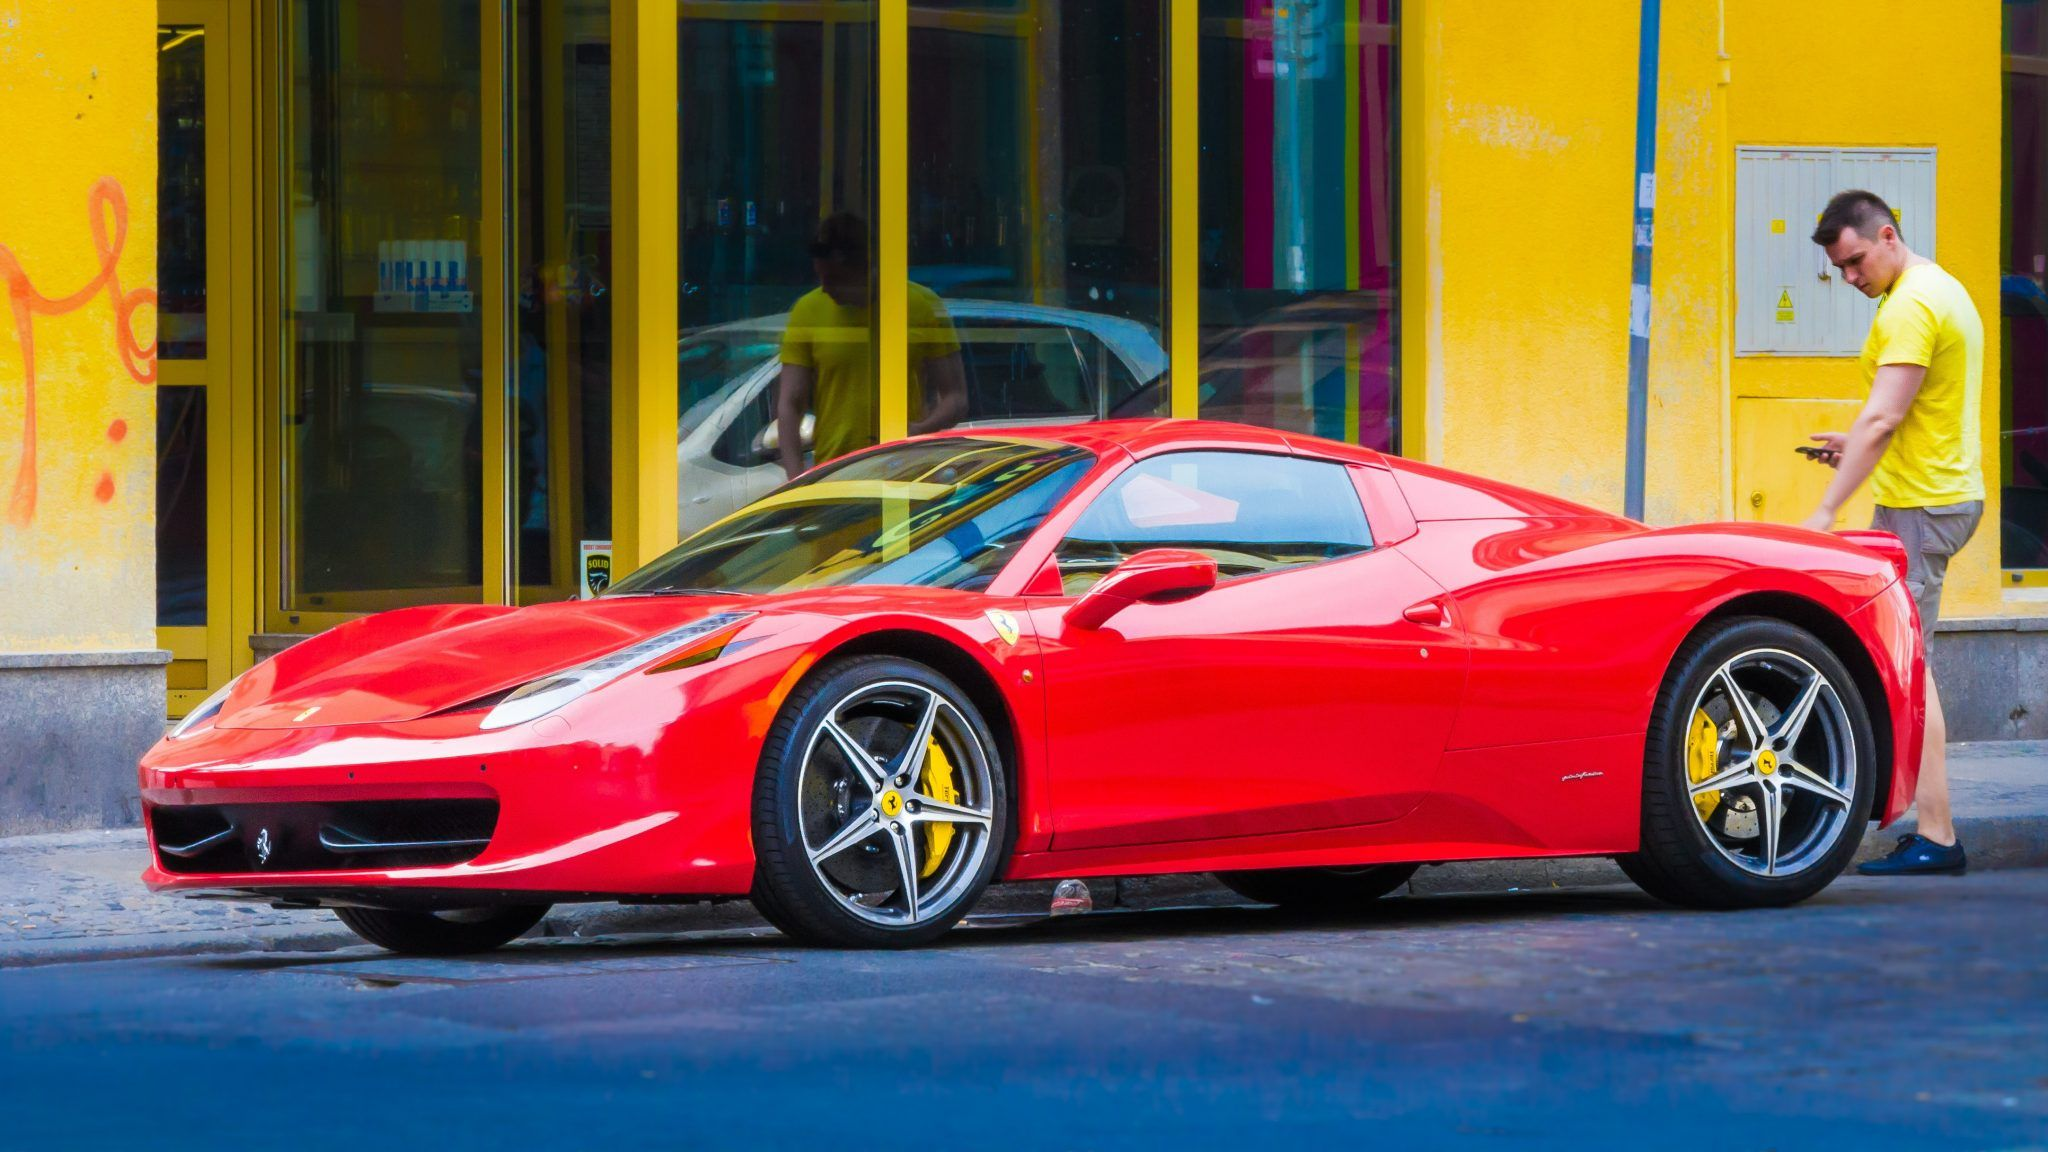 California Tax Attorney Free Consultation 2020 Ferrari 458 Ferrari Buy Used Cars